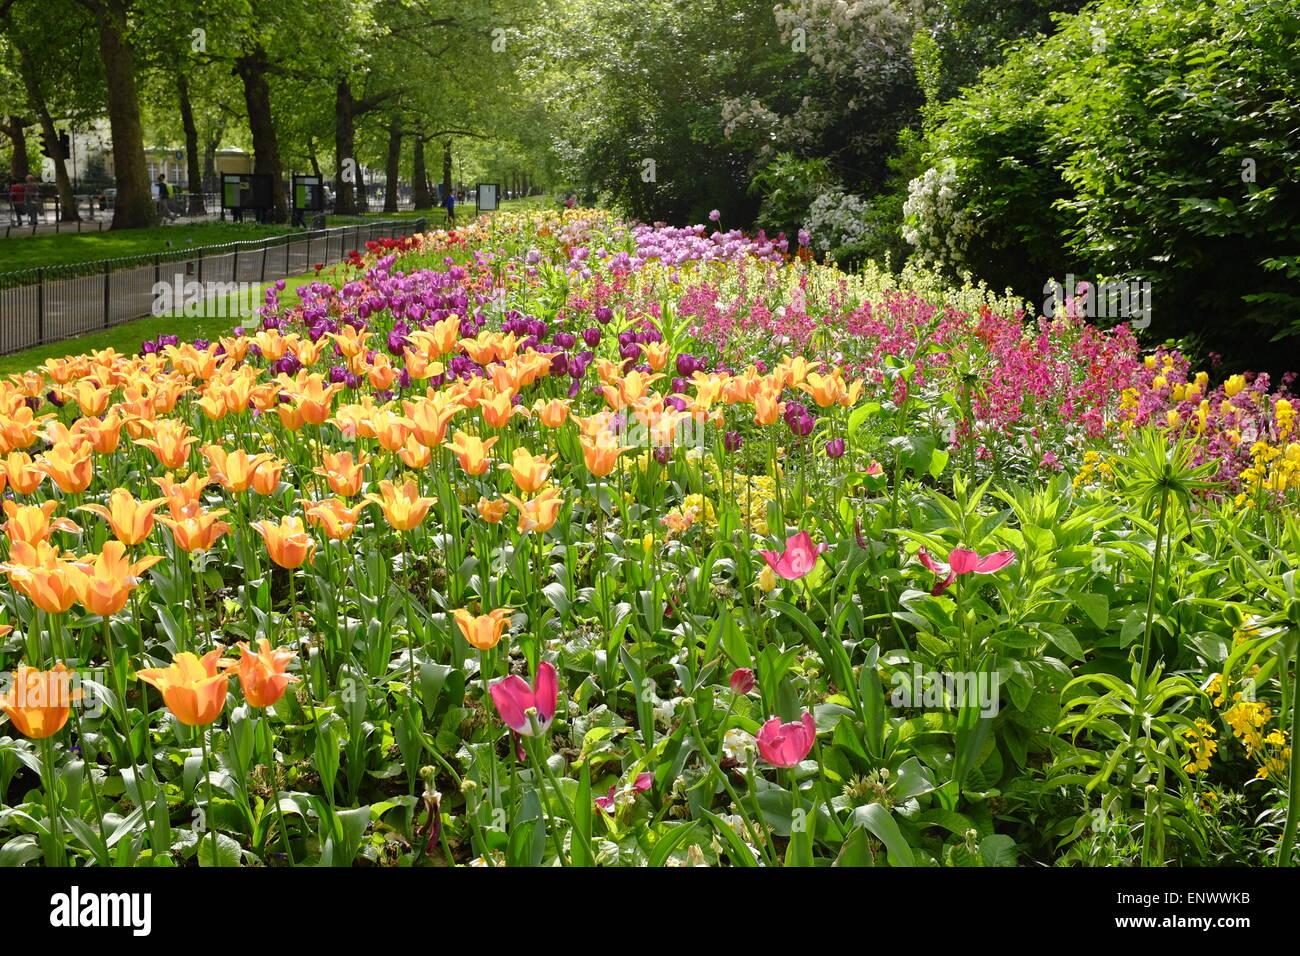 Spring flowers hyde park london uk stock photo 82318191 alamy spring flowers hyde park london uk mightylinksfo